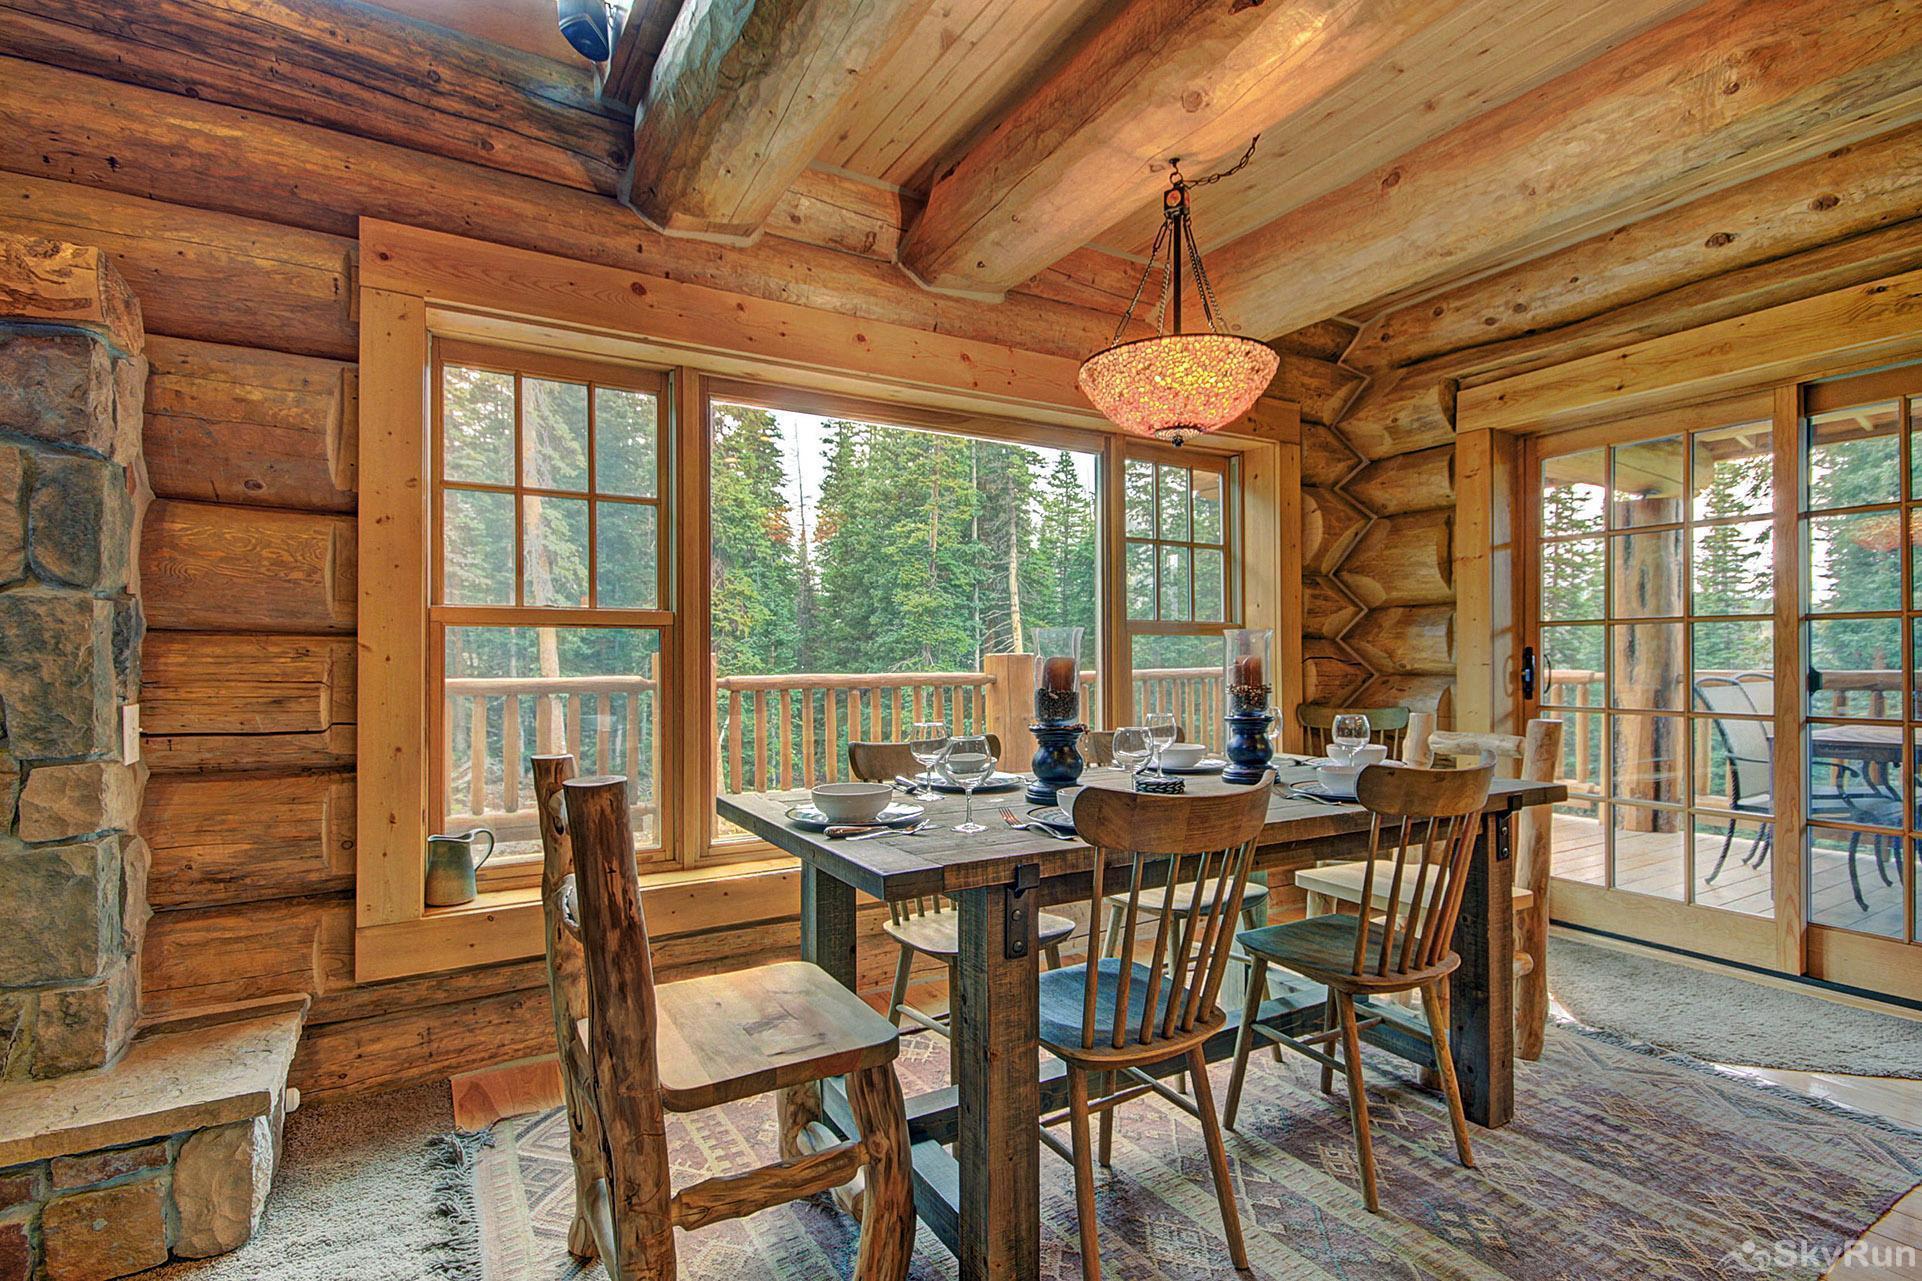 Breckenridge Colorado Vacation Condo | Timber Ridge Lodge